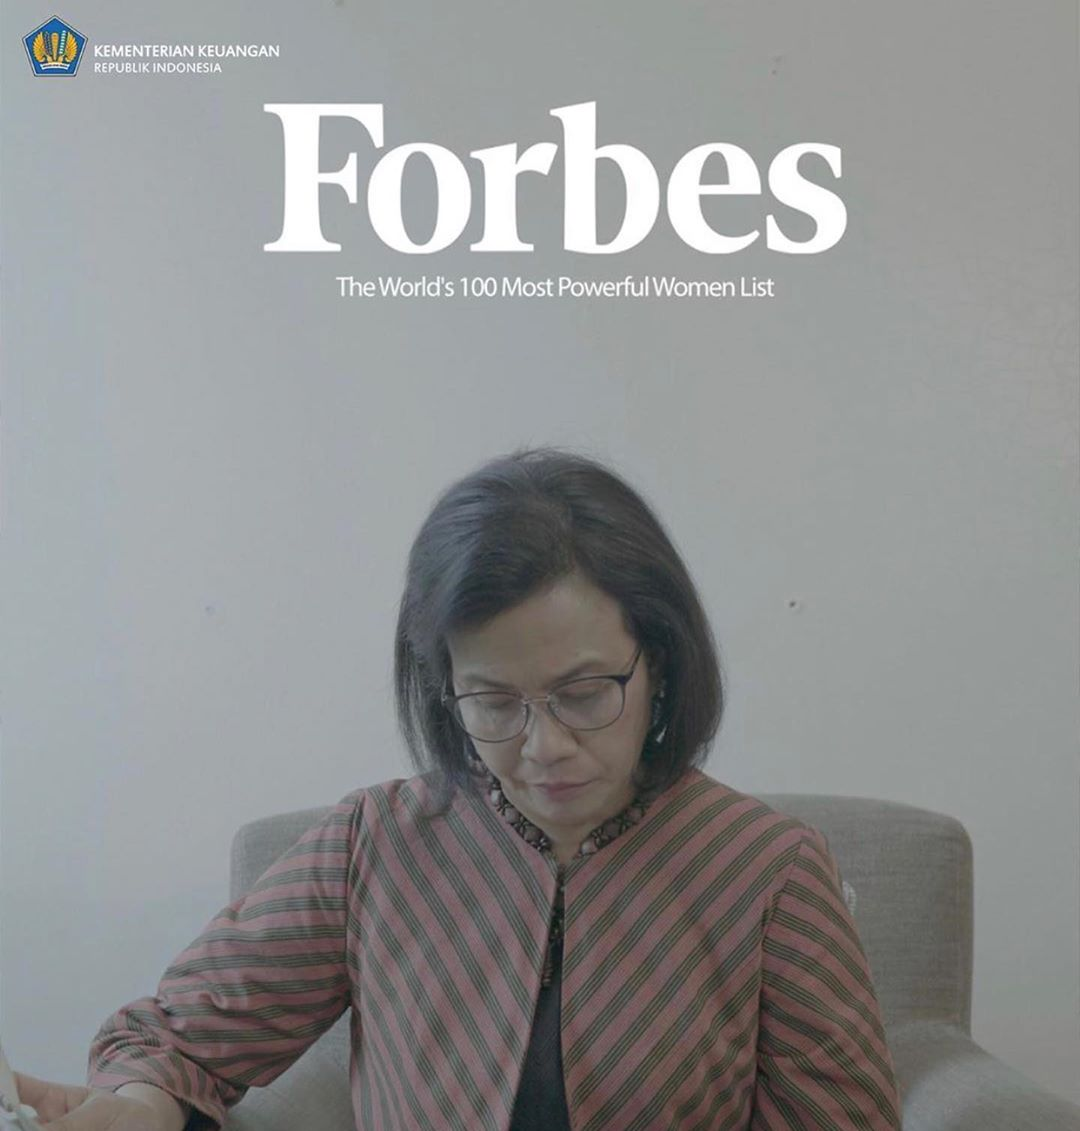 Termasuk salah satu The World's 100 Most Powerful Women 2019 versi majalah Forbes.  Selamat Ibu @smindrawati, prestasi ibu bukan hanya jadi kebanggaan, tapi juga inspirasi bagi seluruh keluarga besar @kemenkeuri.  Foto: Biro KLI/ @irwndferrypic.twitter.com/5KcxxGE1KS